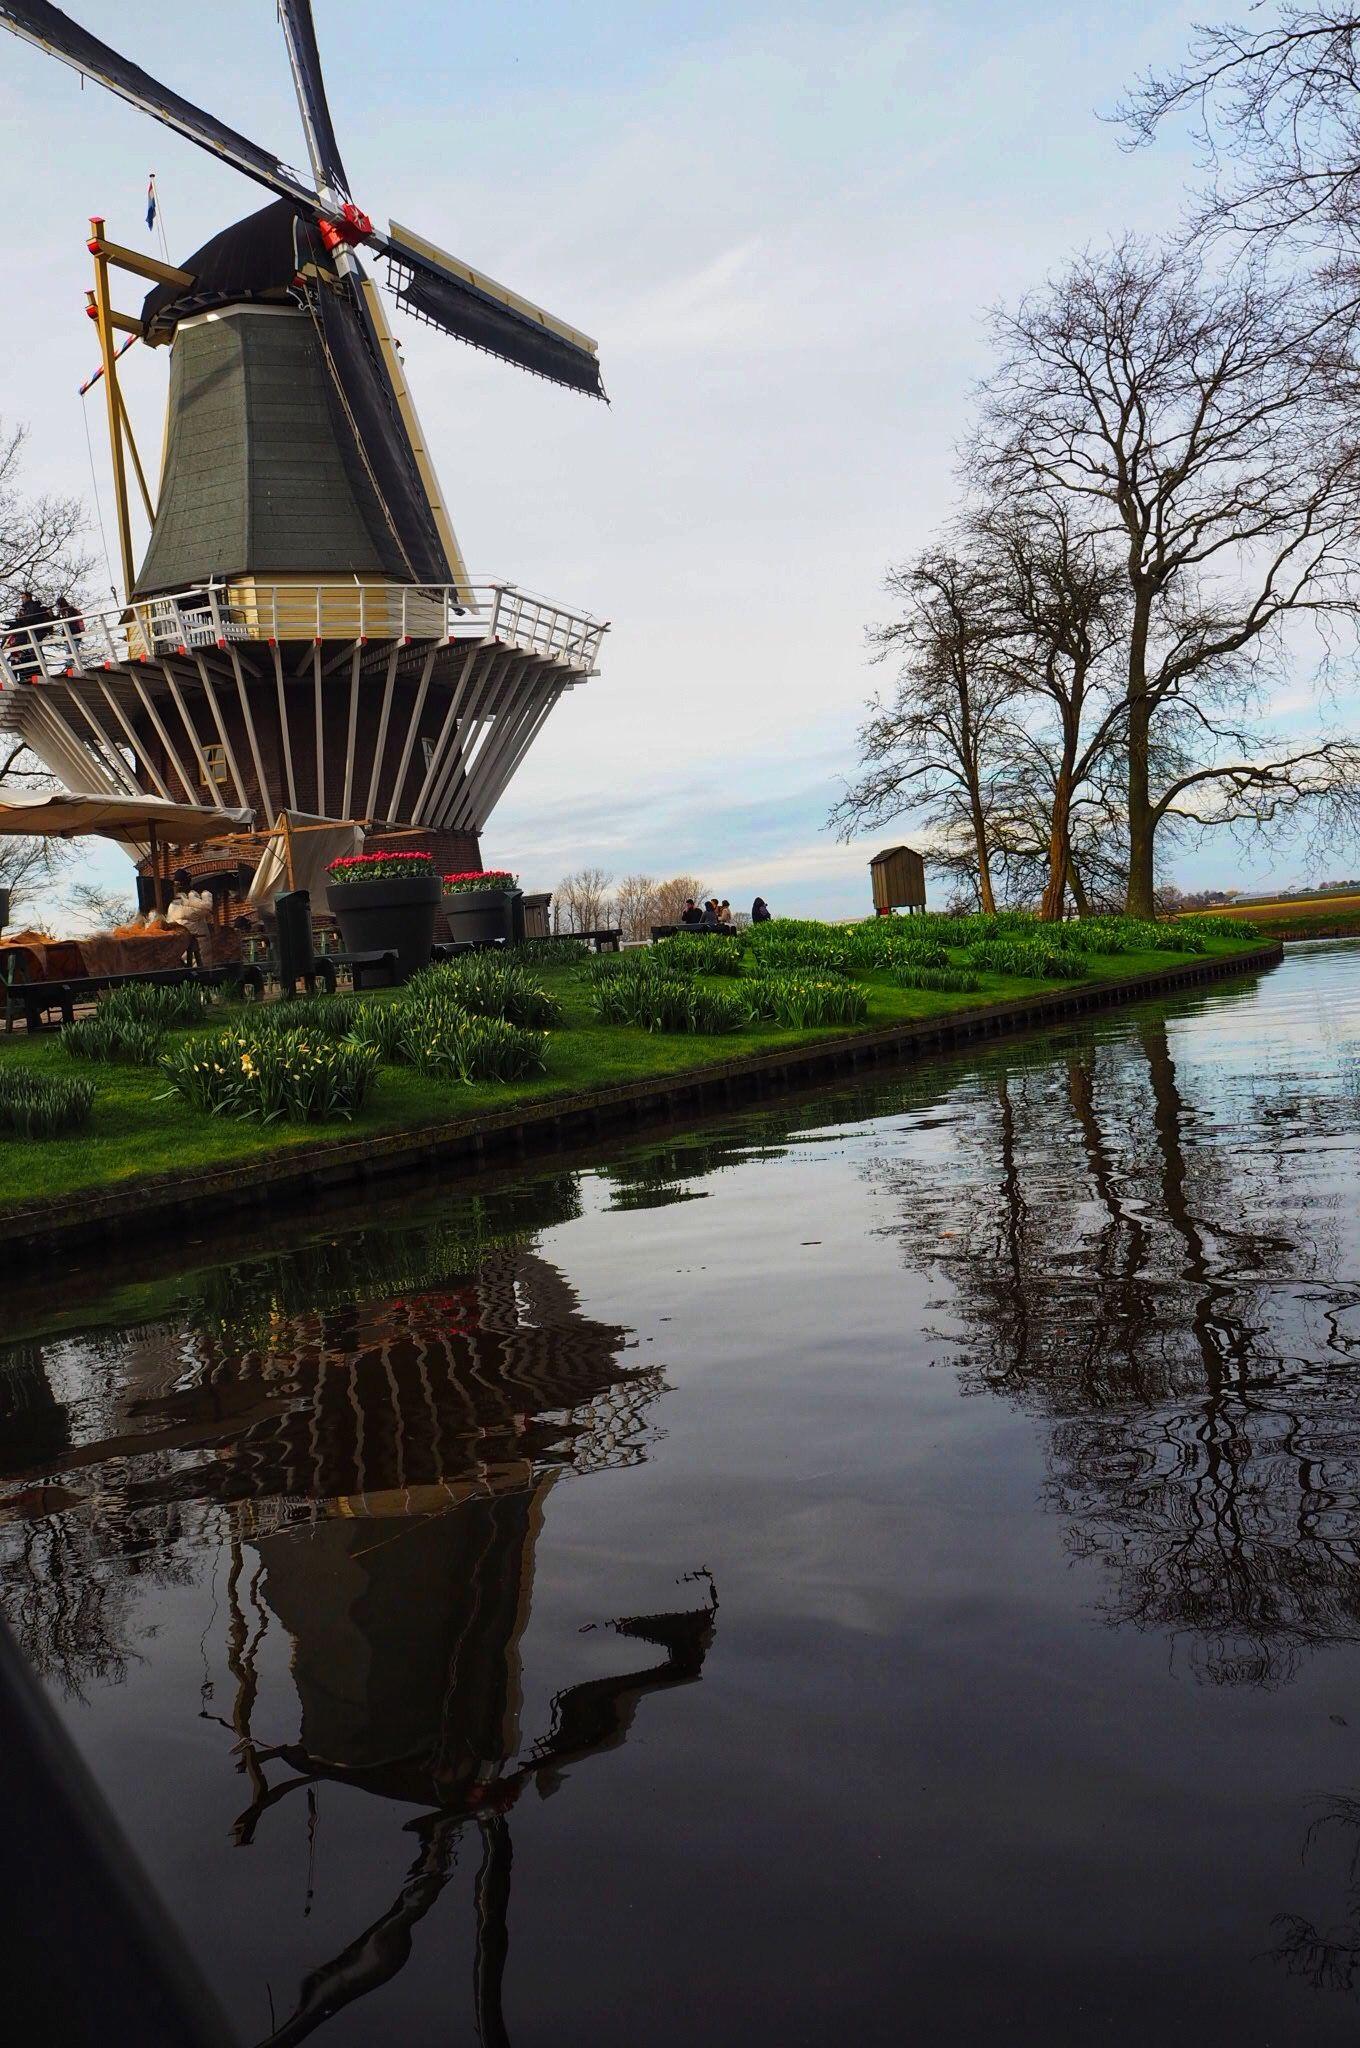 Windmill reflections at Keukenhof Tulip Gardens Lisse